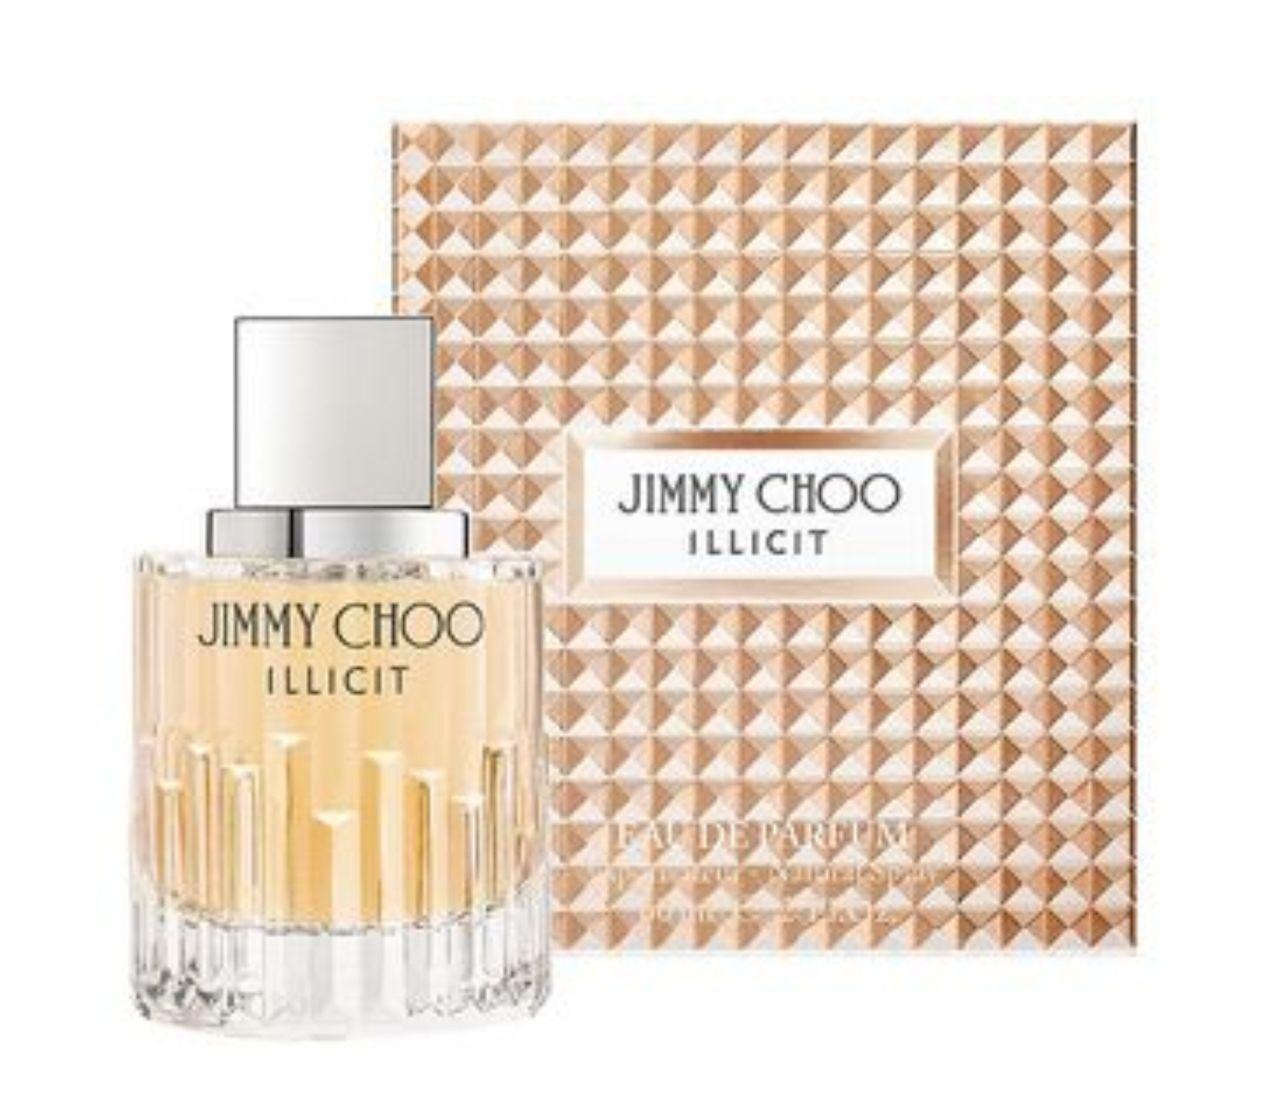 Jimmy Choo Illicit Eau de Parfum Spray 60ml + Free Delivery - £24.99 at Fragrance Direct